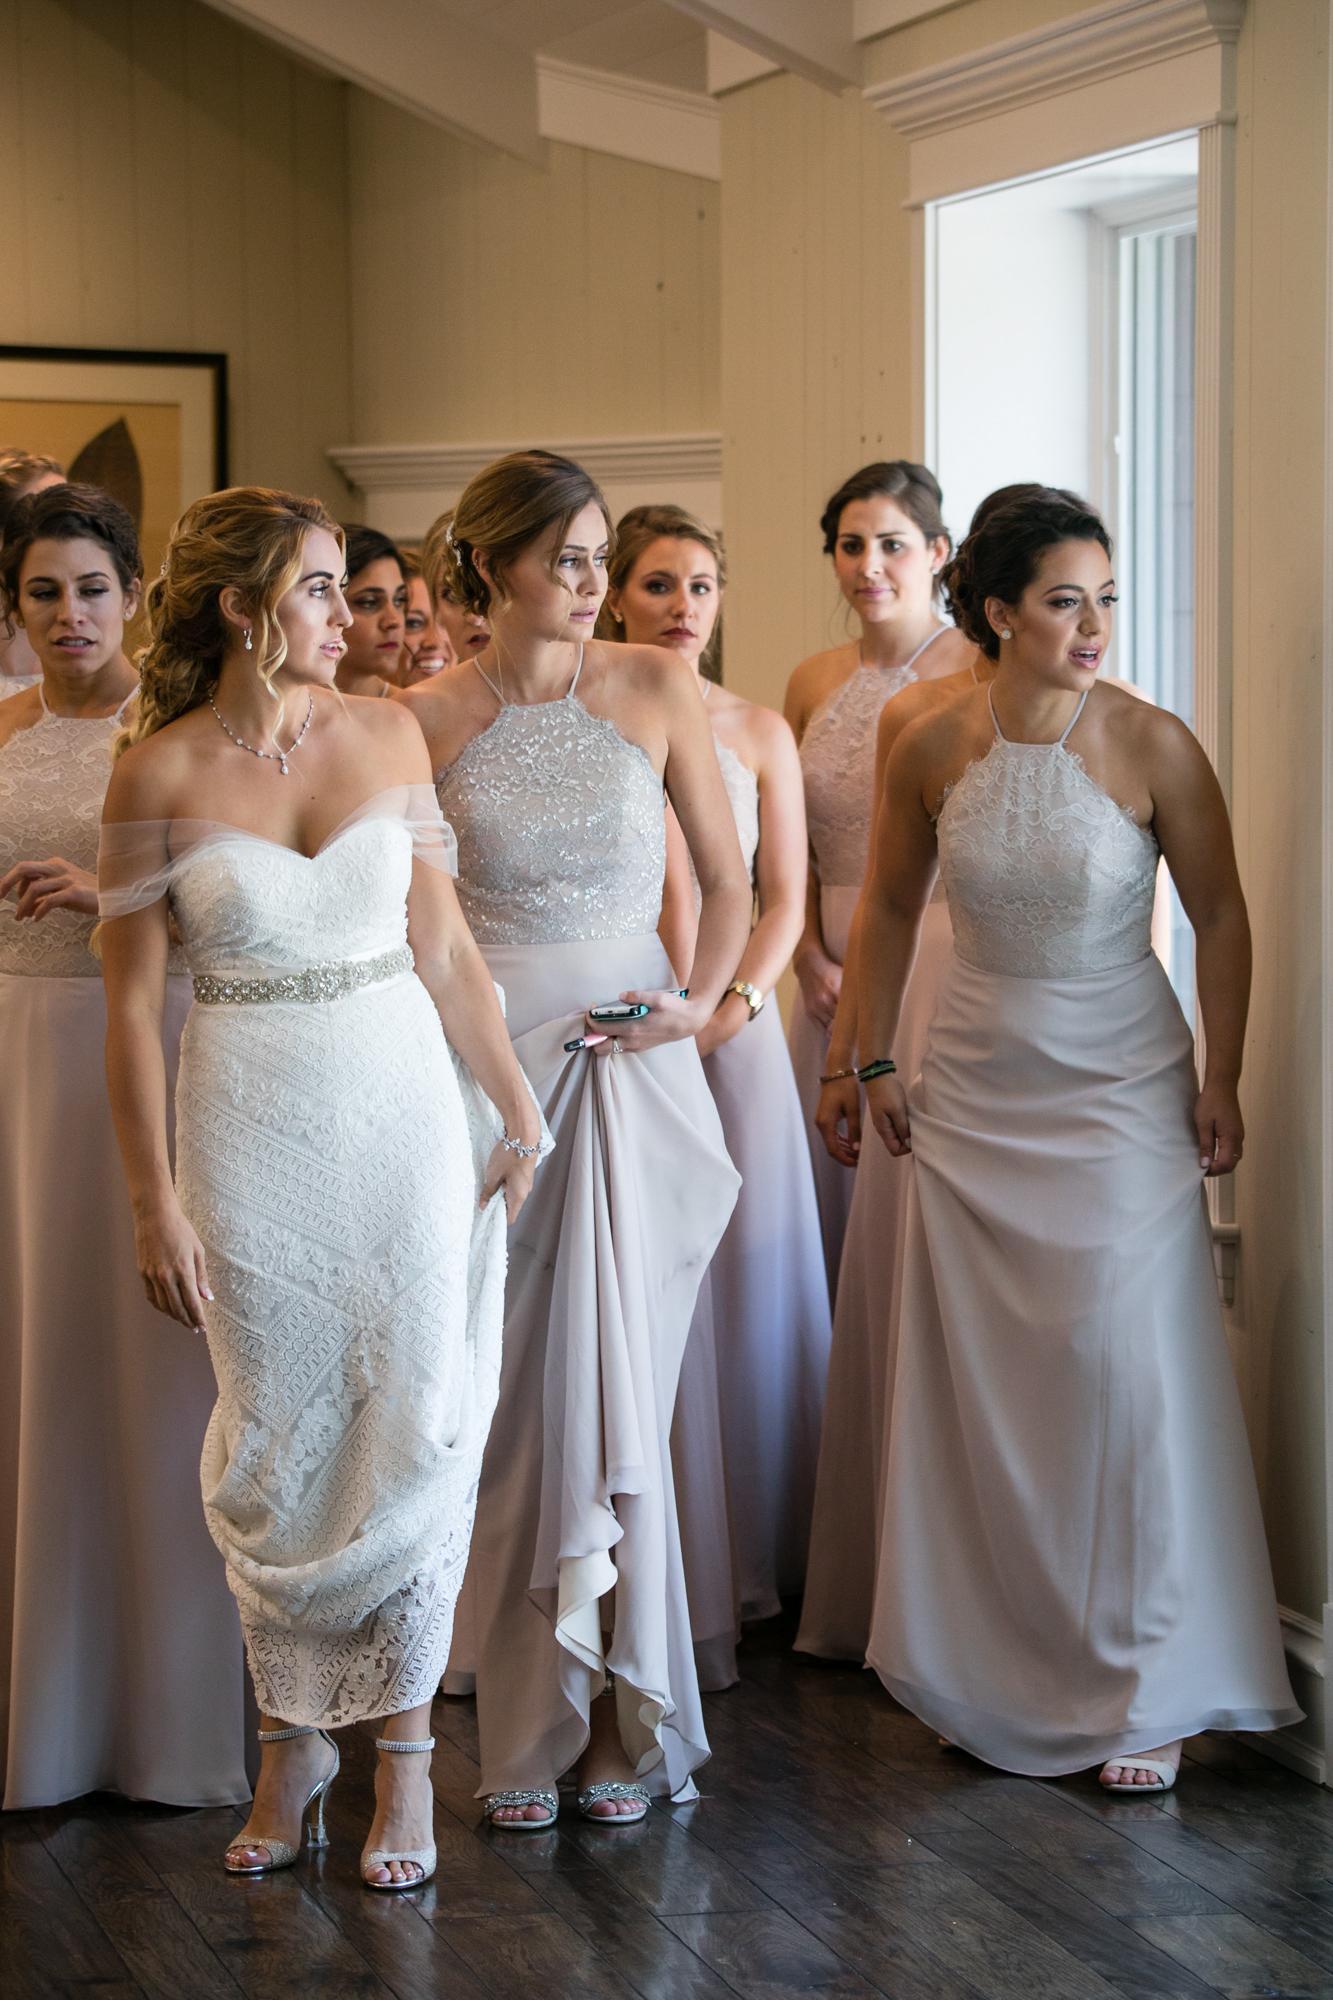 greek-wedding-salt-lake-city-utah-4.jpg